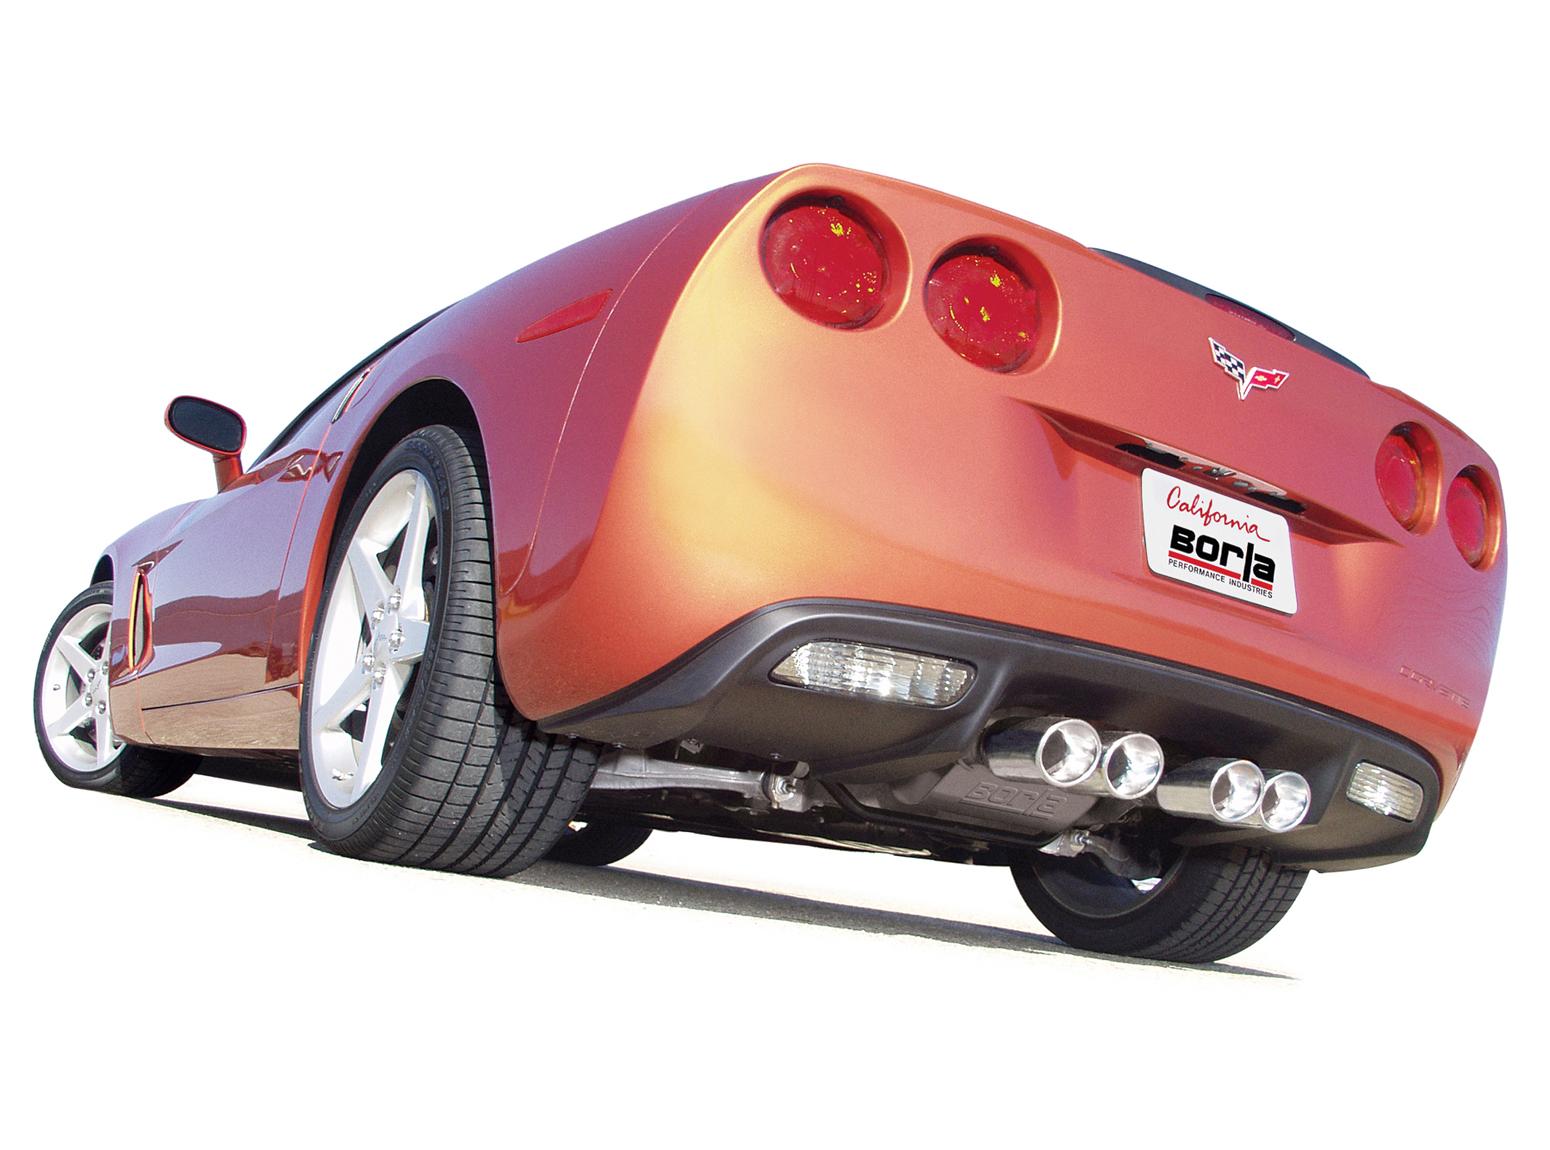 c6 corvette borla stinger exhaust cat back and x pipe 140128